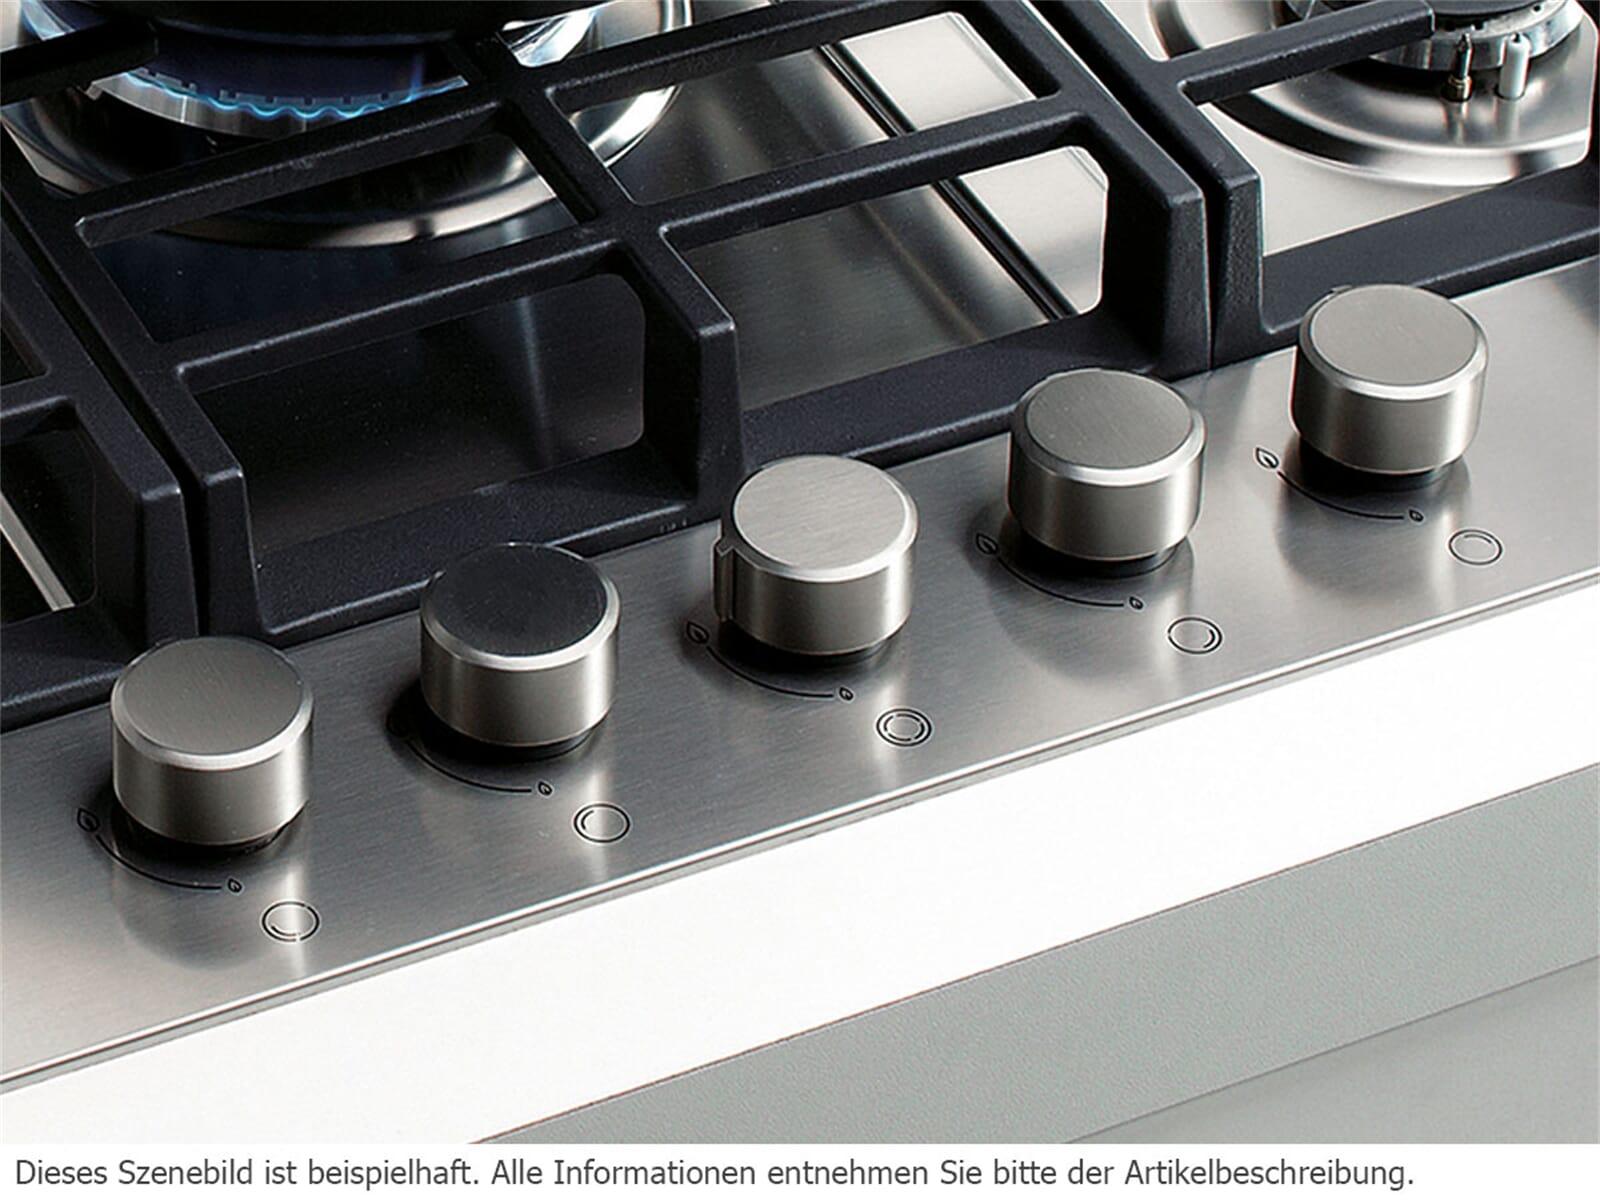 Gorenje G 340 UX Domino Edelstahl Gaskochfeld autark